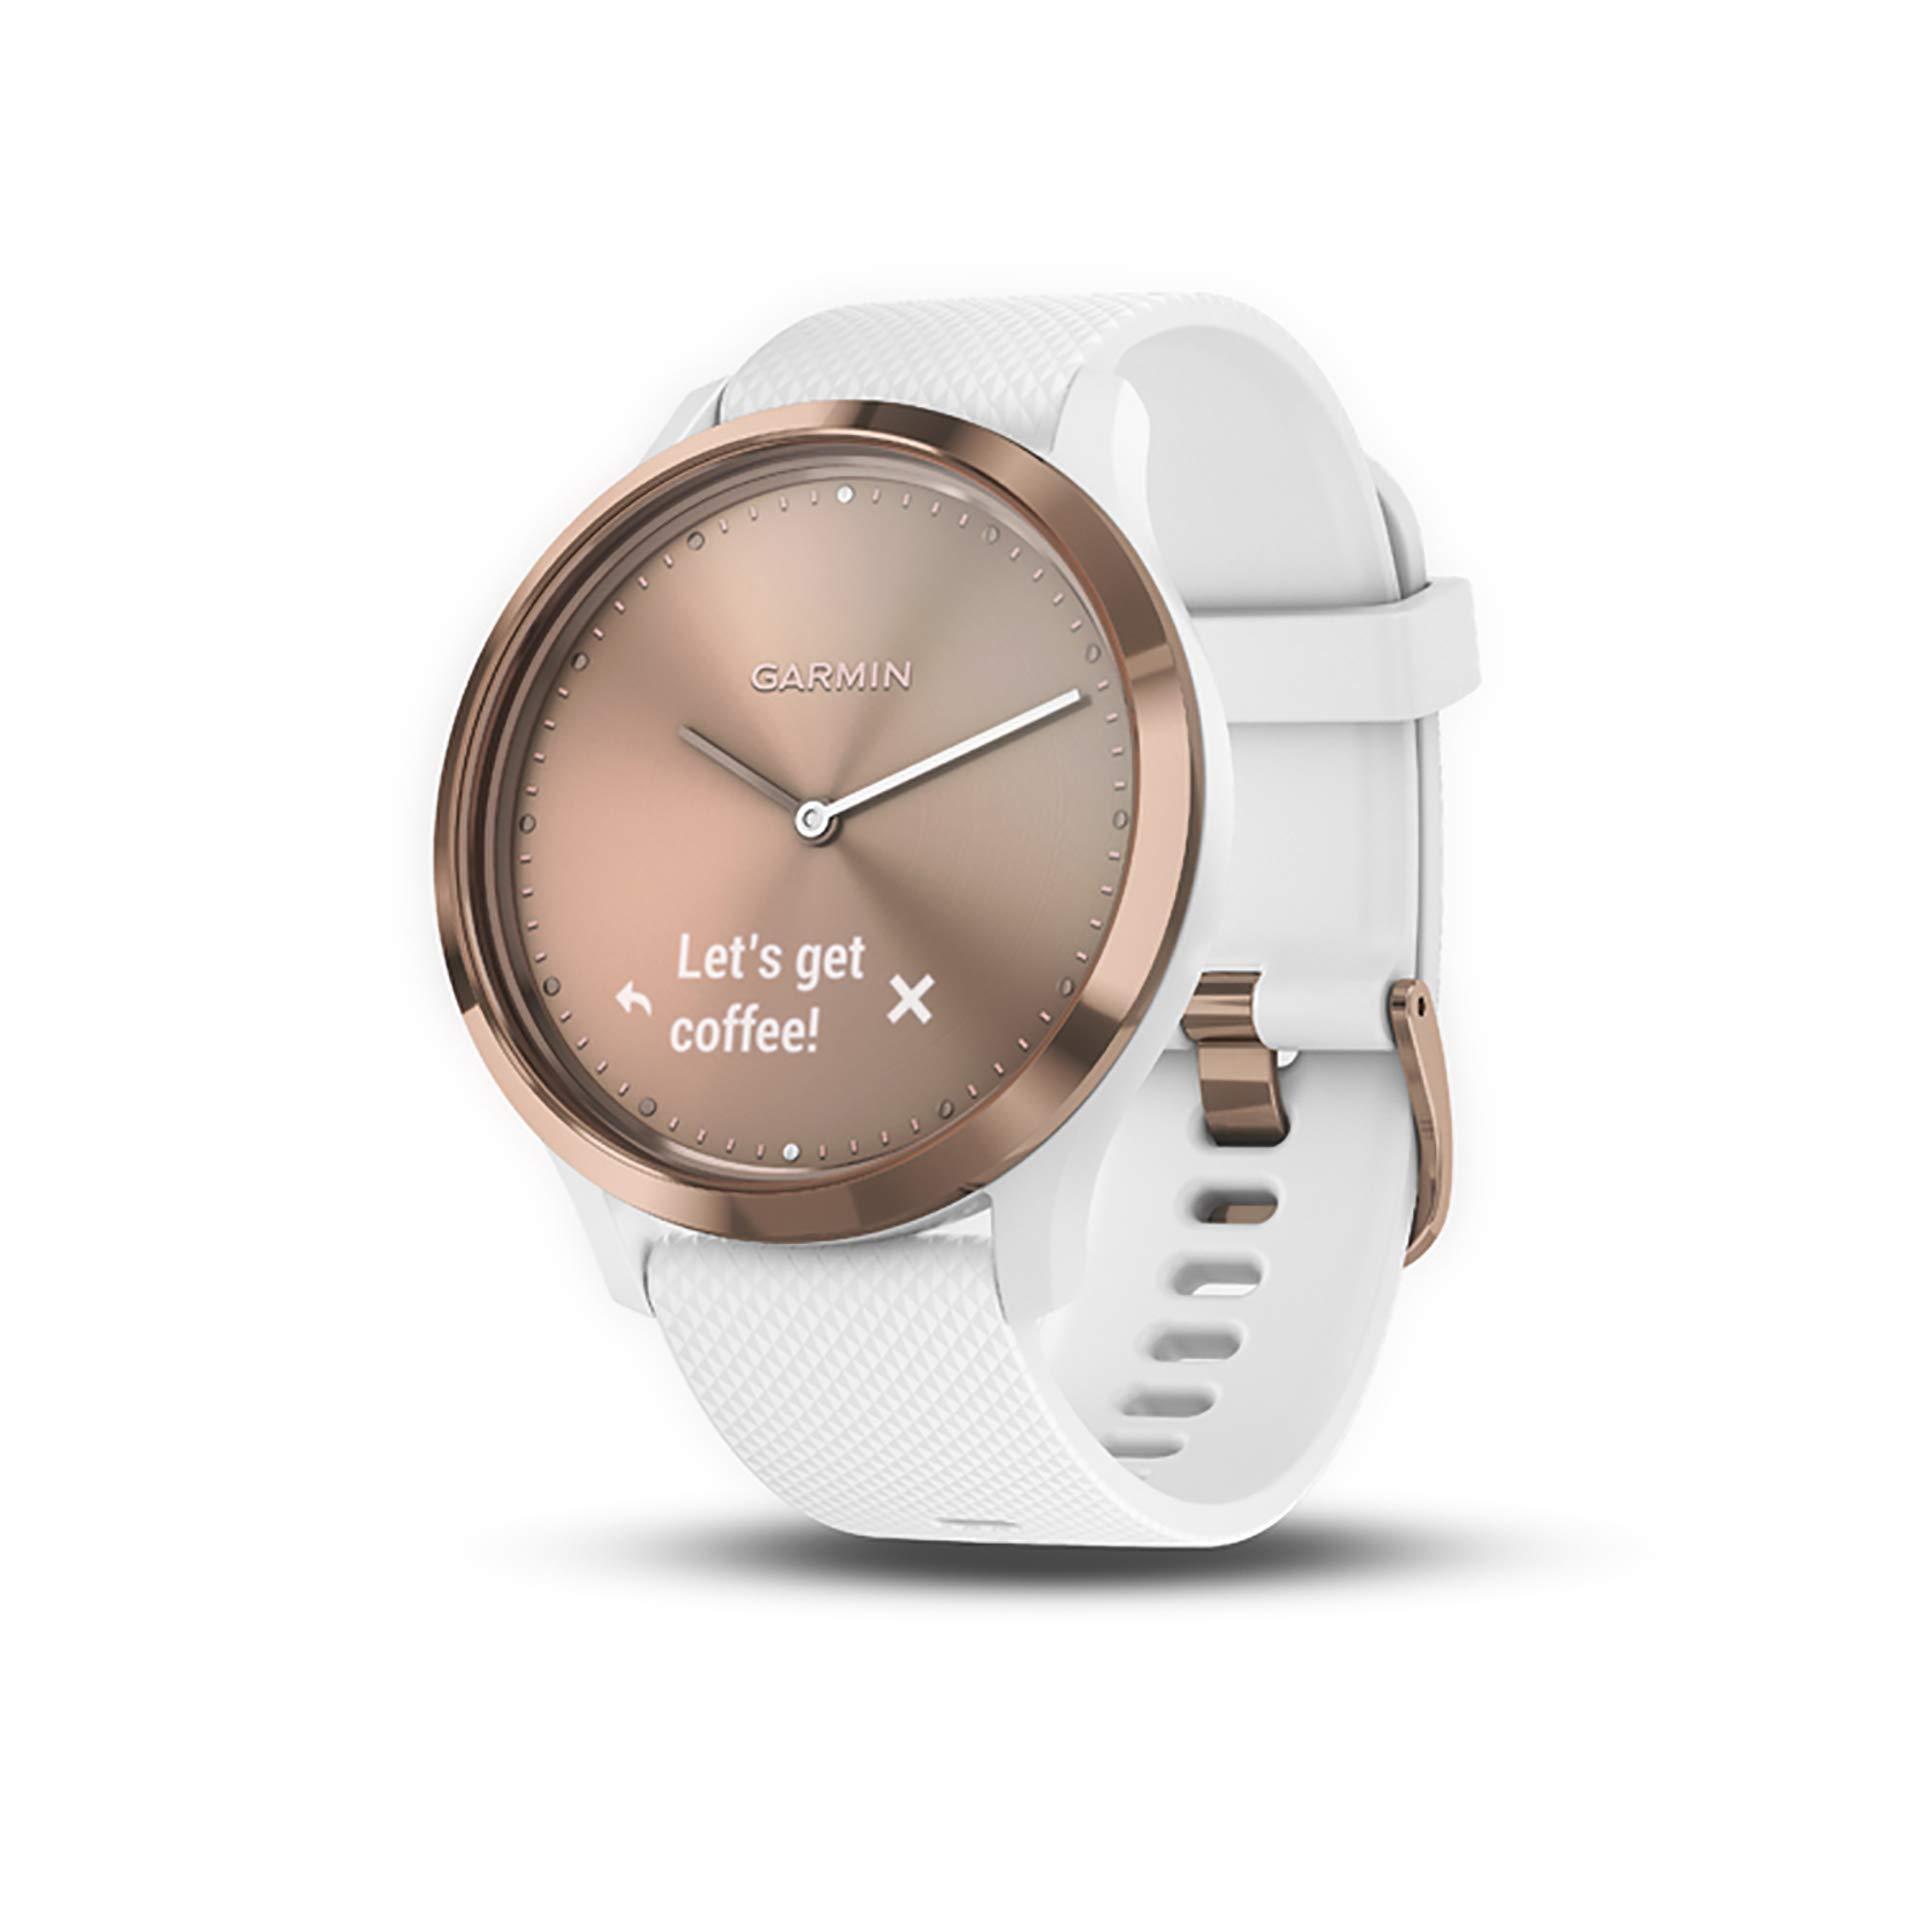 Garmin vívomove HR, Hybrid Smartwatch for Men and Women, White/Rose Gold by Garmin